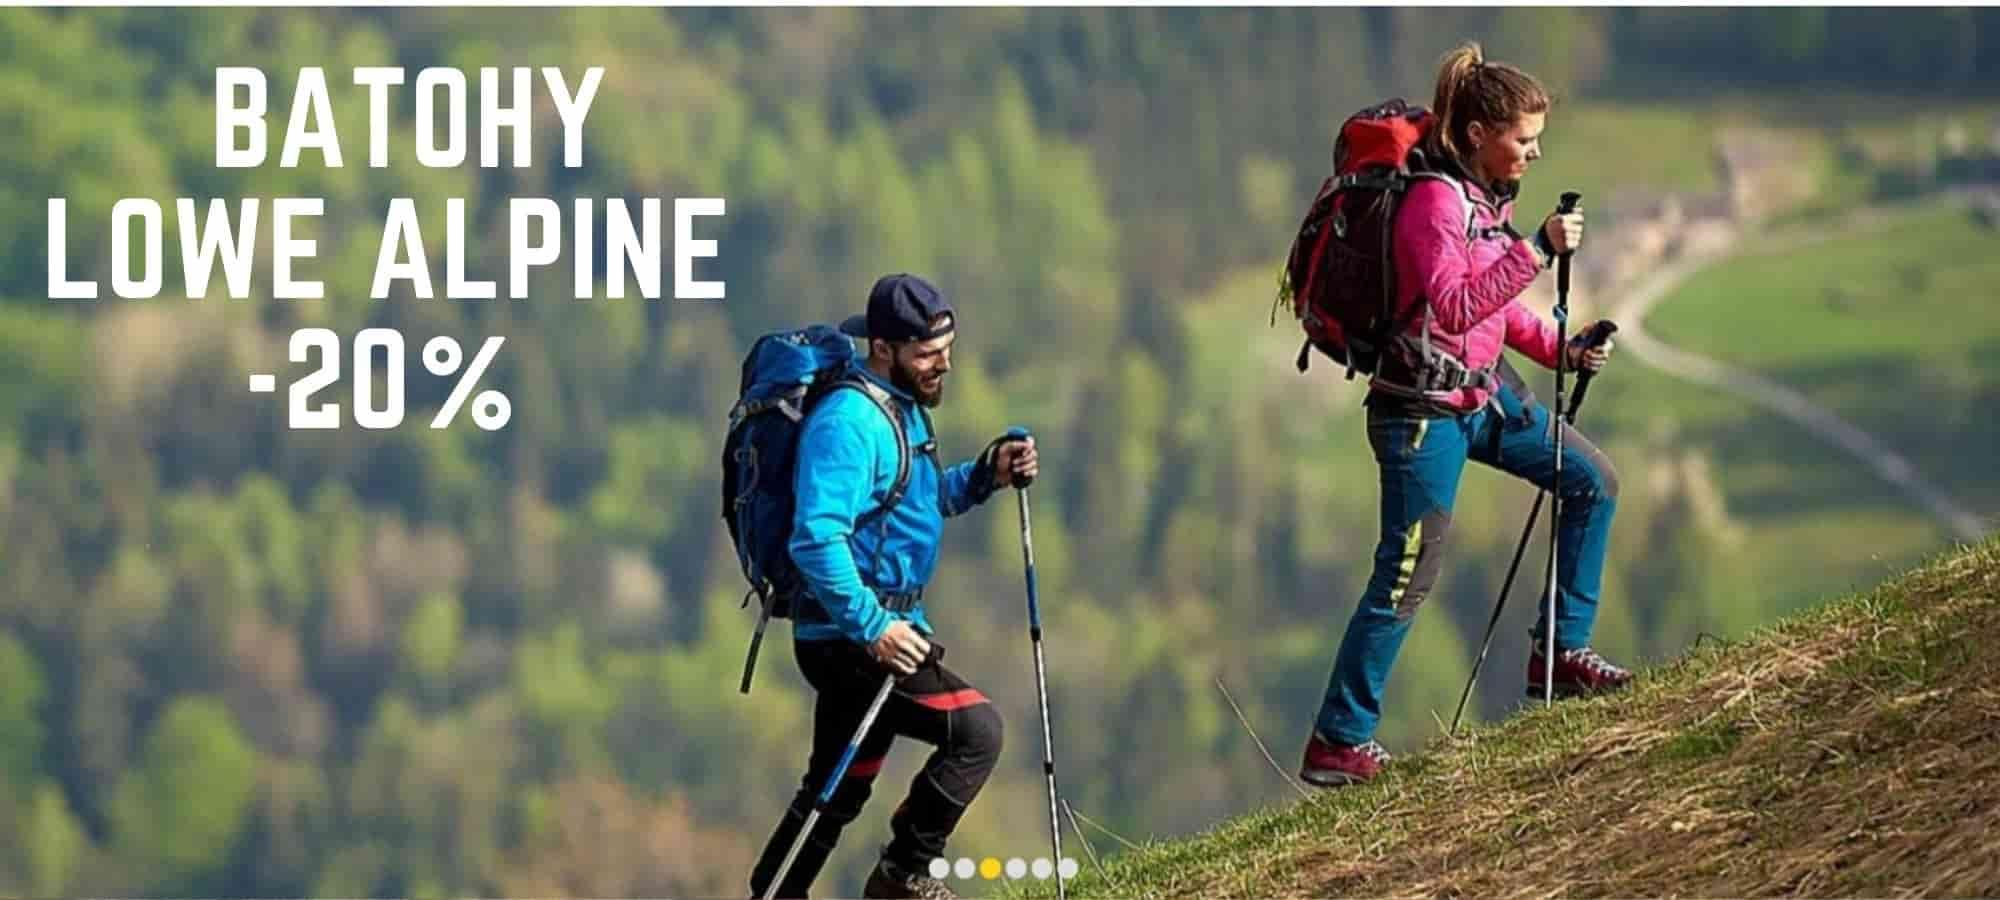 Batohy Lowe Alpine sleva - 20%